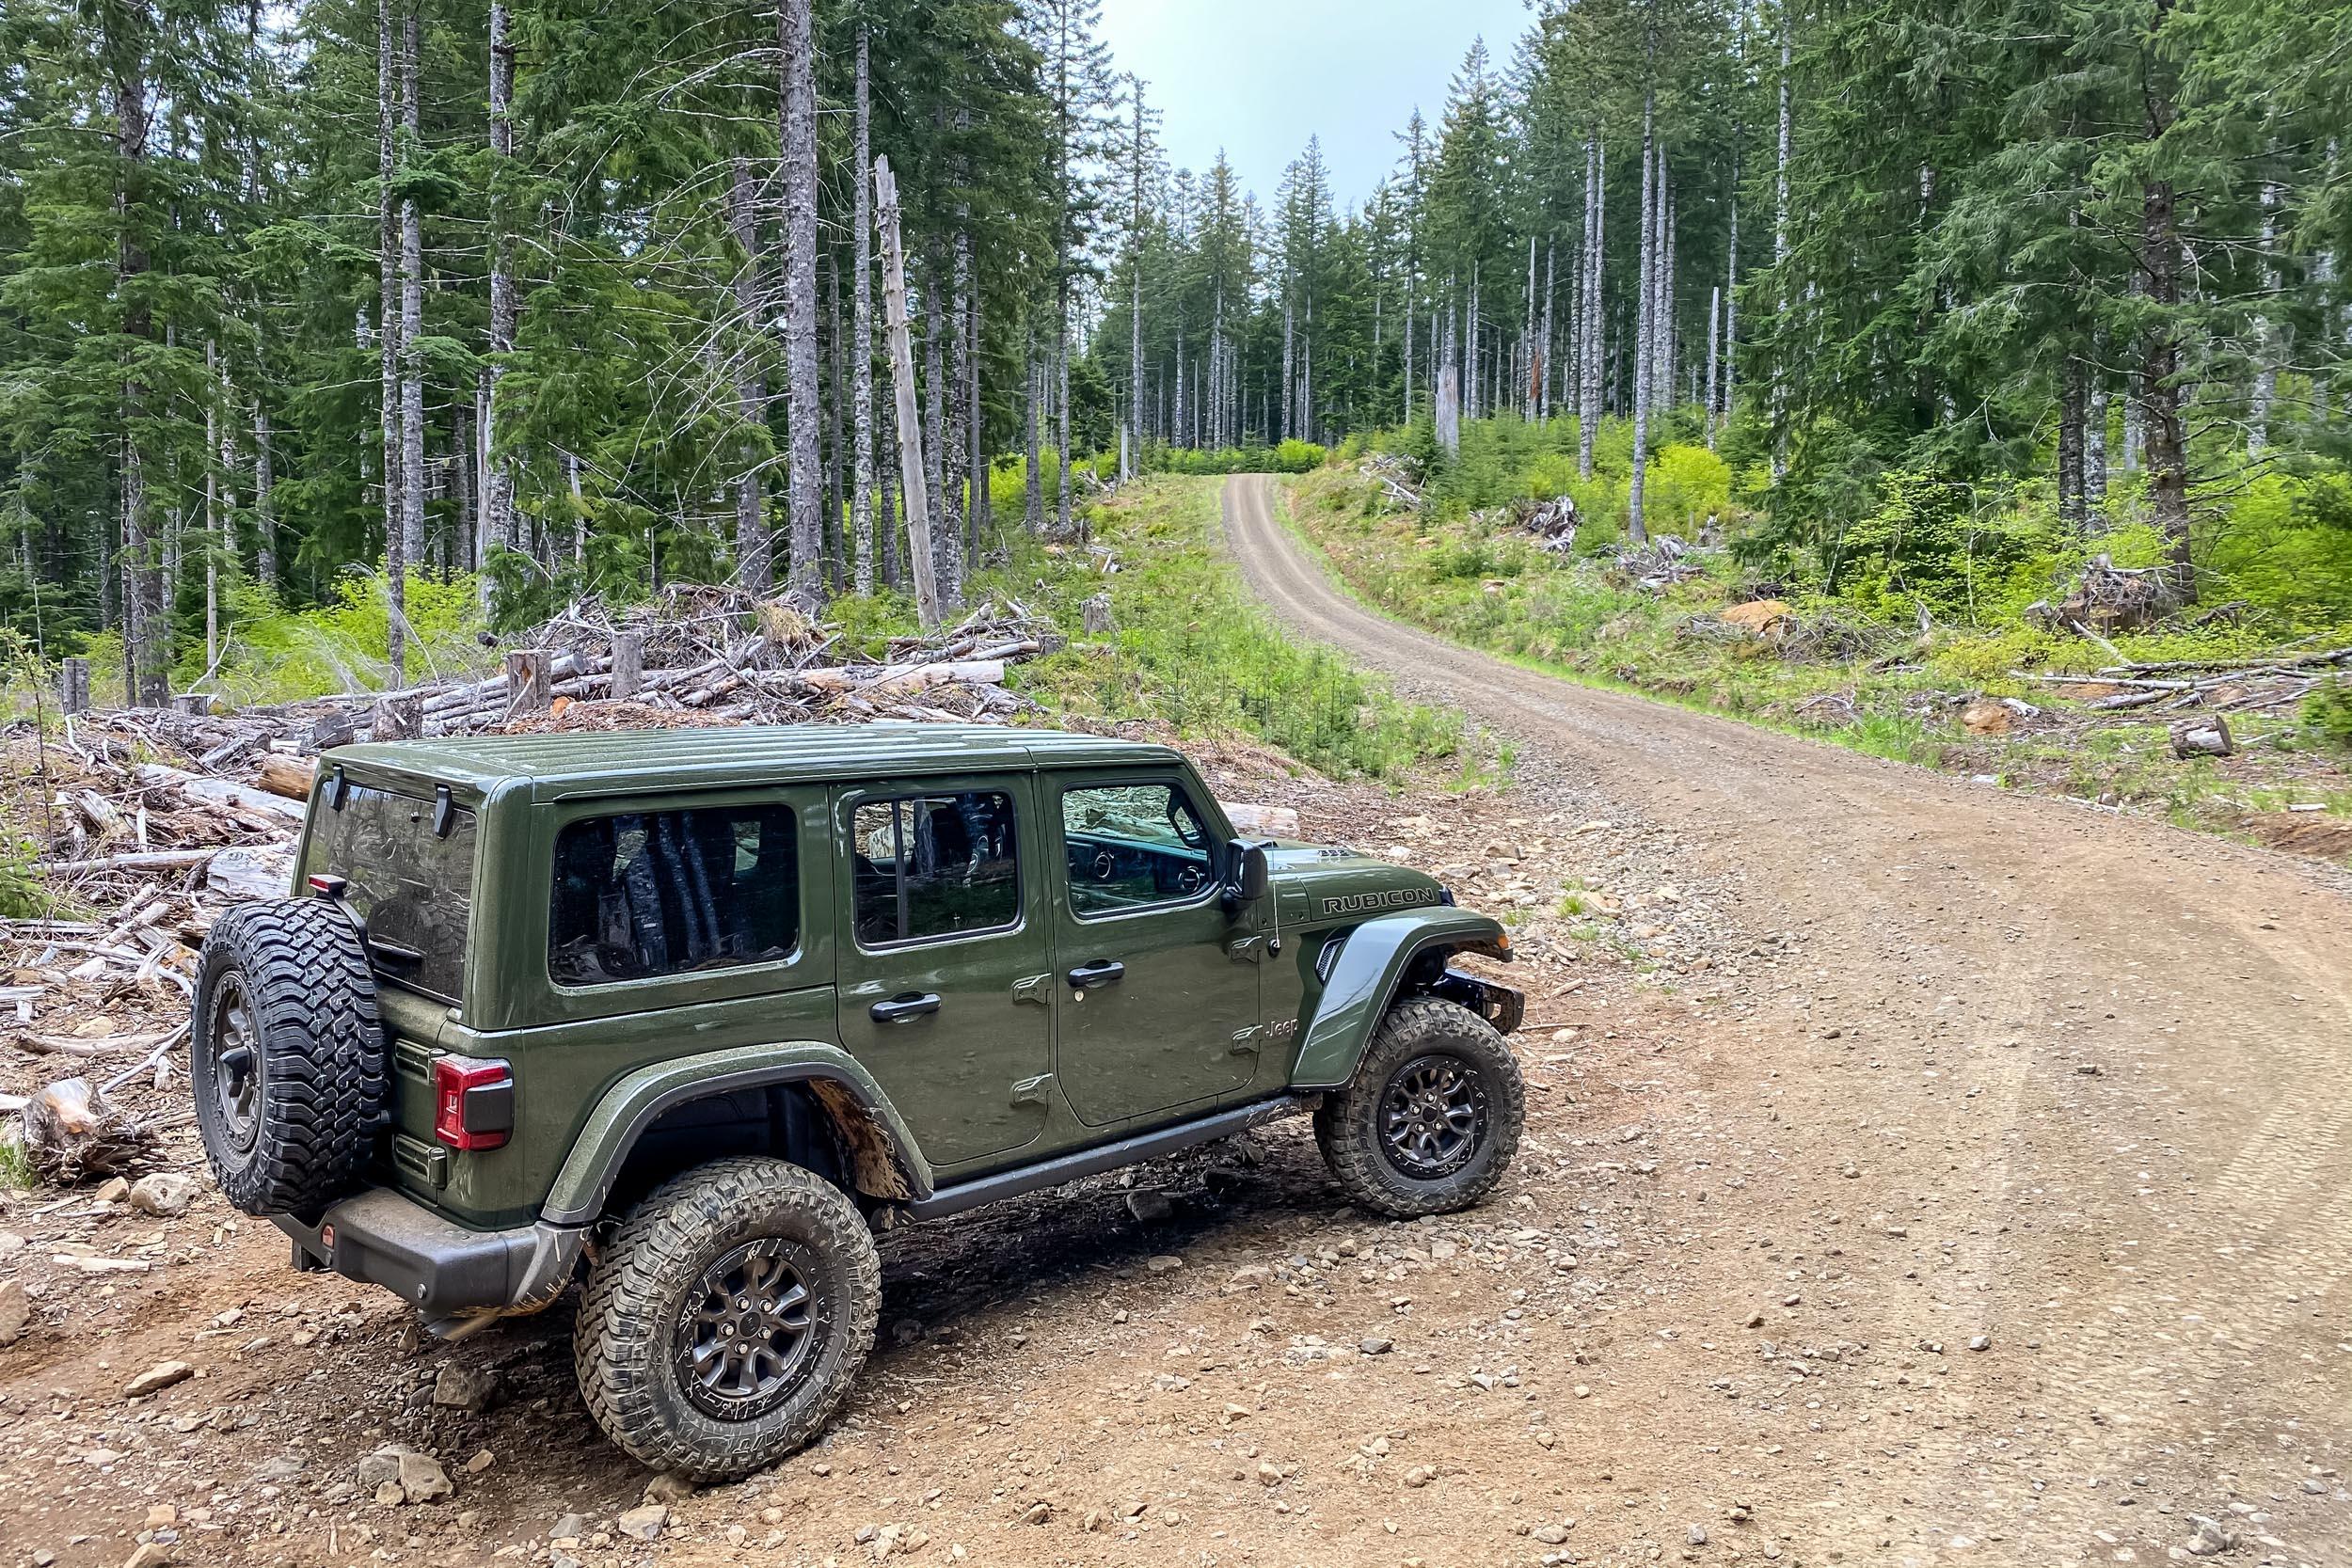 2021 Jeep Wrangler Rubicon 392 gravel road